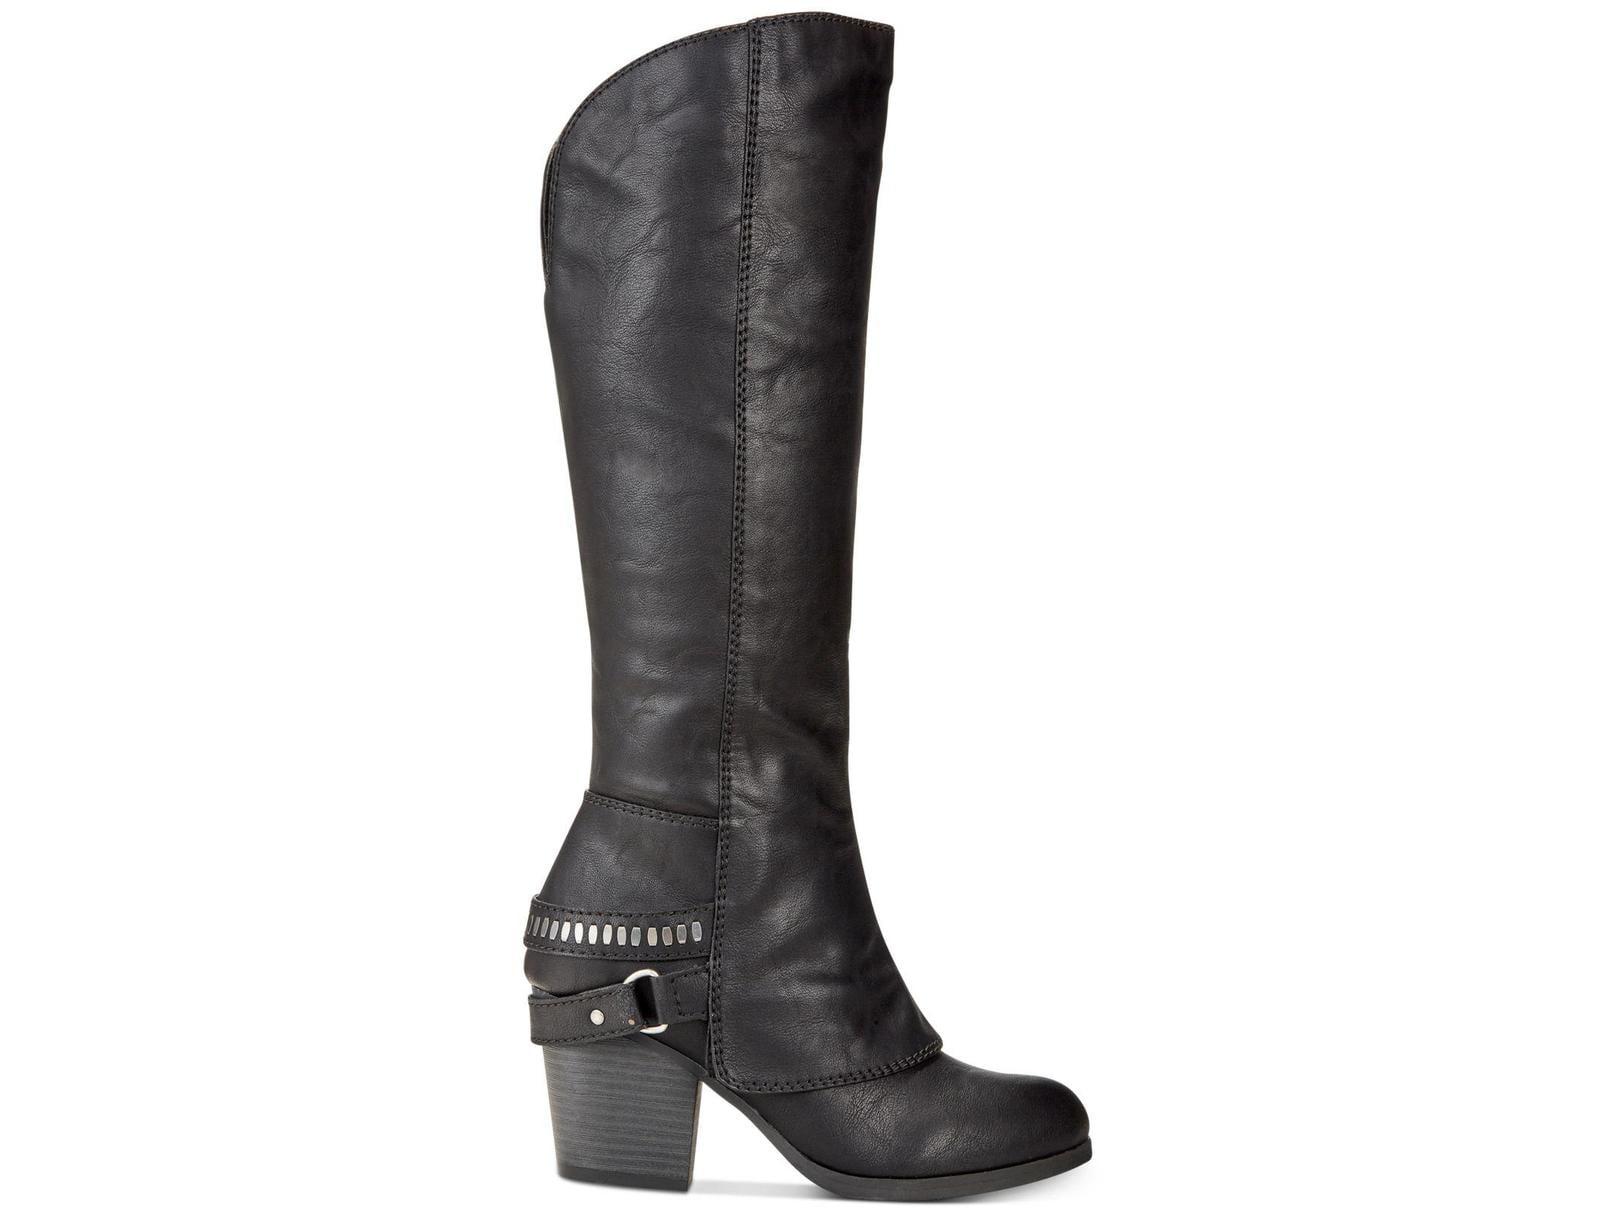 04d19c7f669 American Rag Womens Edyth Closed Toe Knee High Fashion Boots